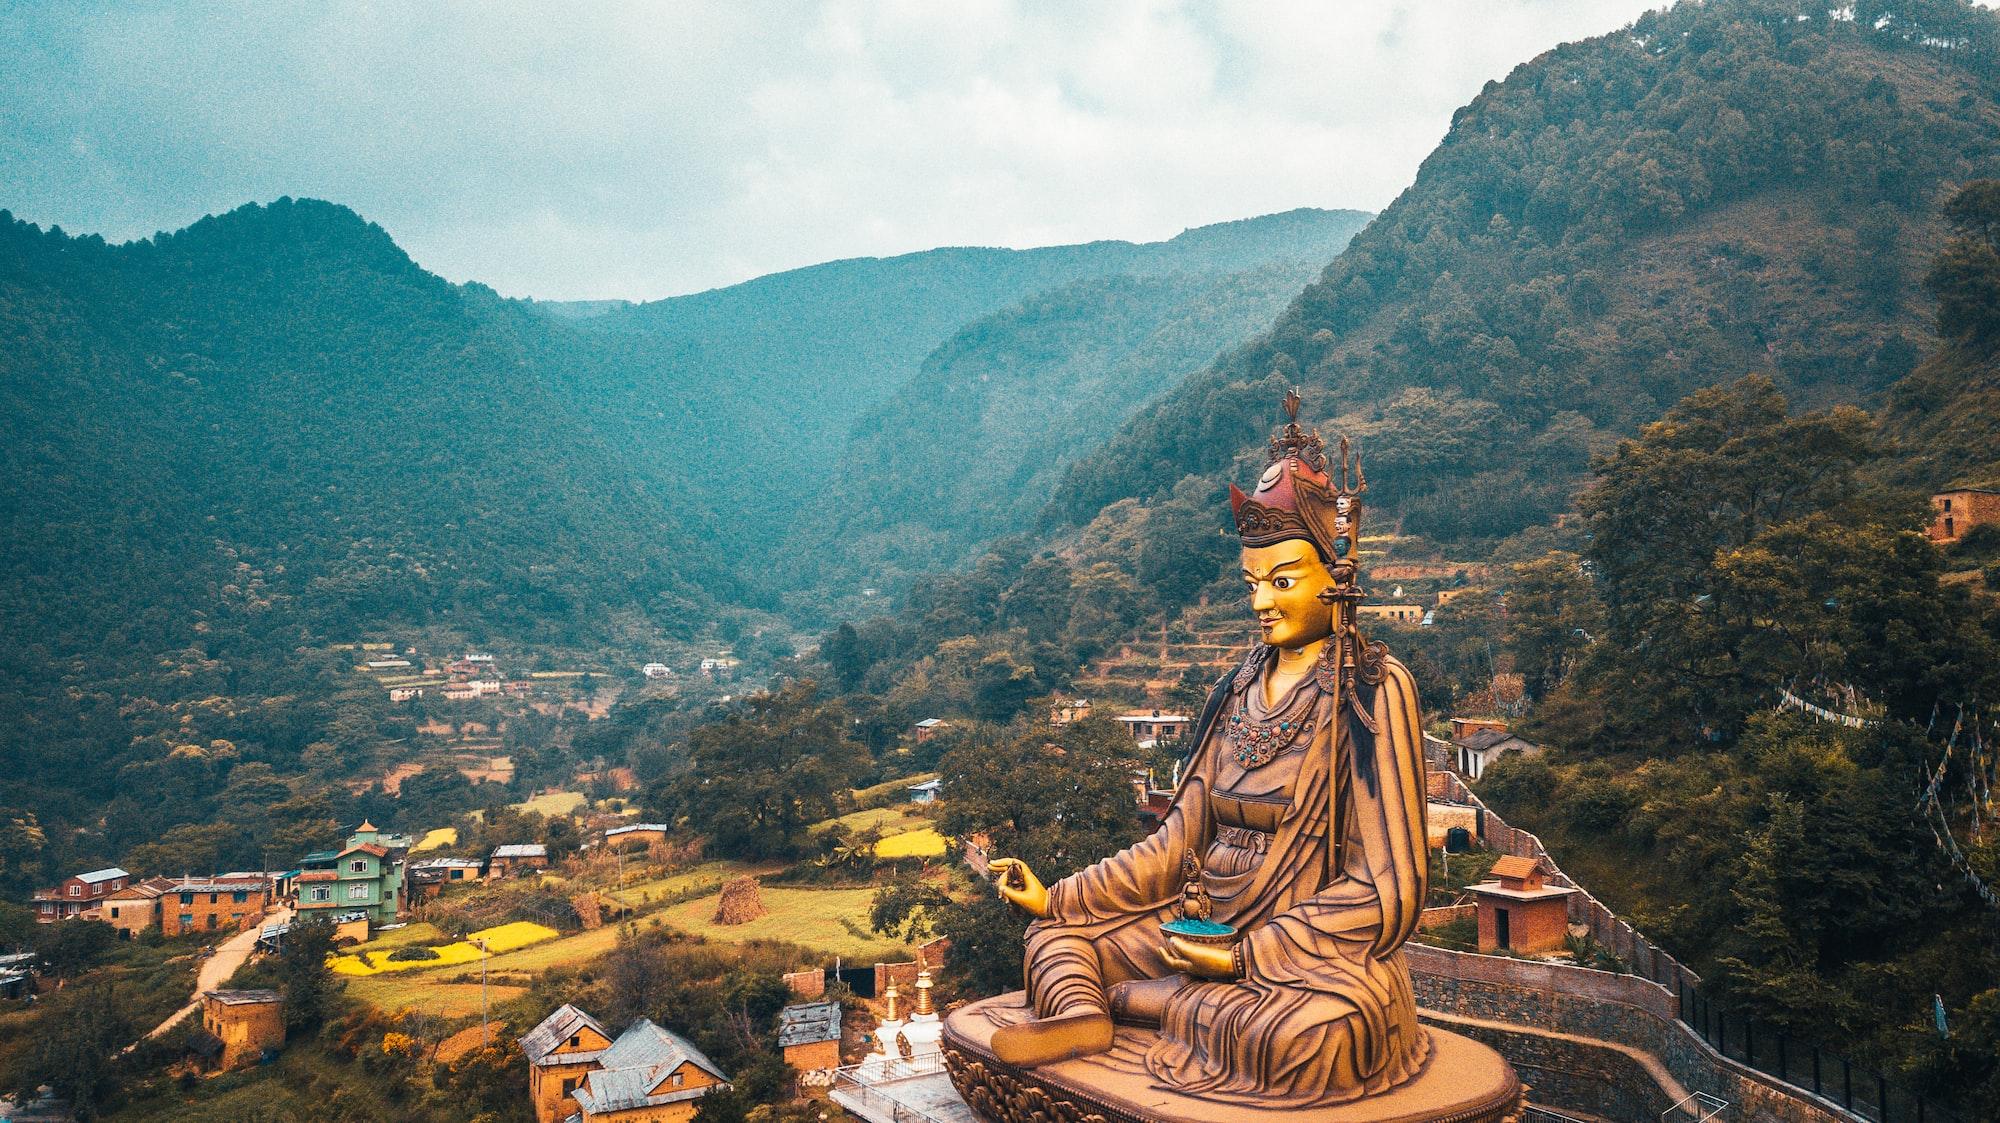 View of Statue Temple of Guru Padmasambhava from air: Pharping, Nepal - October 16, 2017 Video from Mavic drone